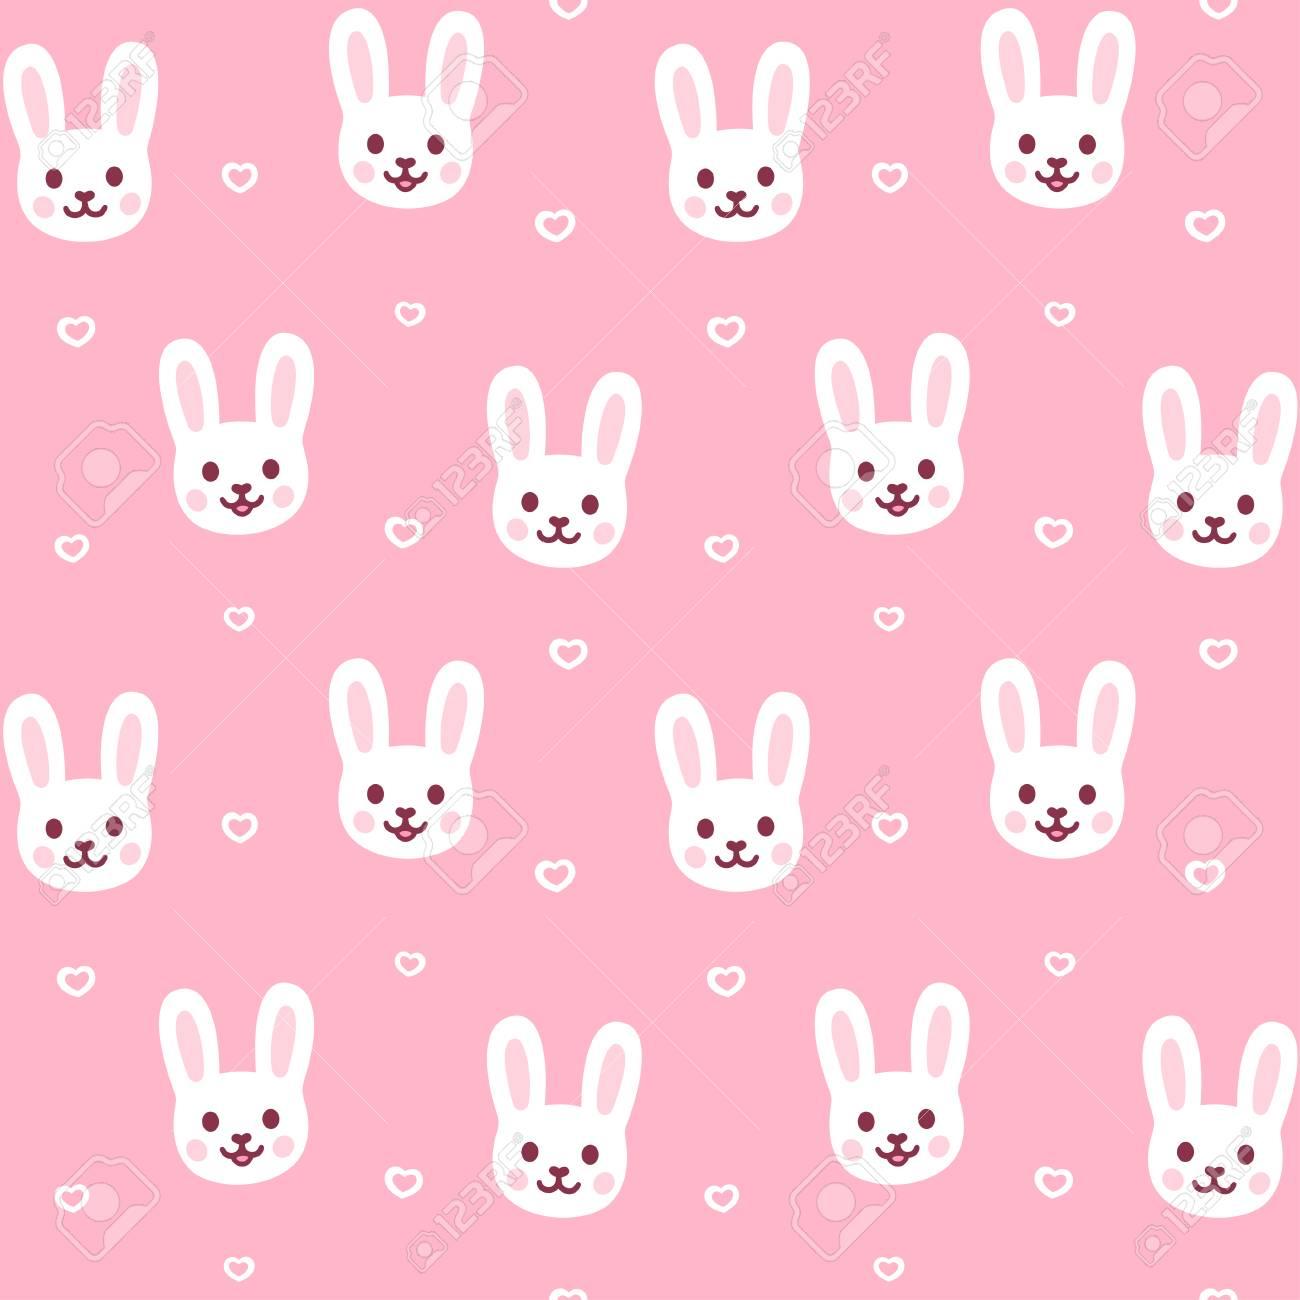 Cute Cartoon Rabbit Pattern Easter Bunny Face Repeating Texture